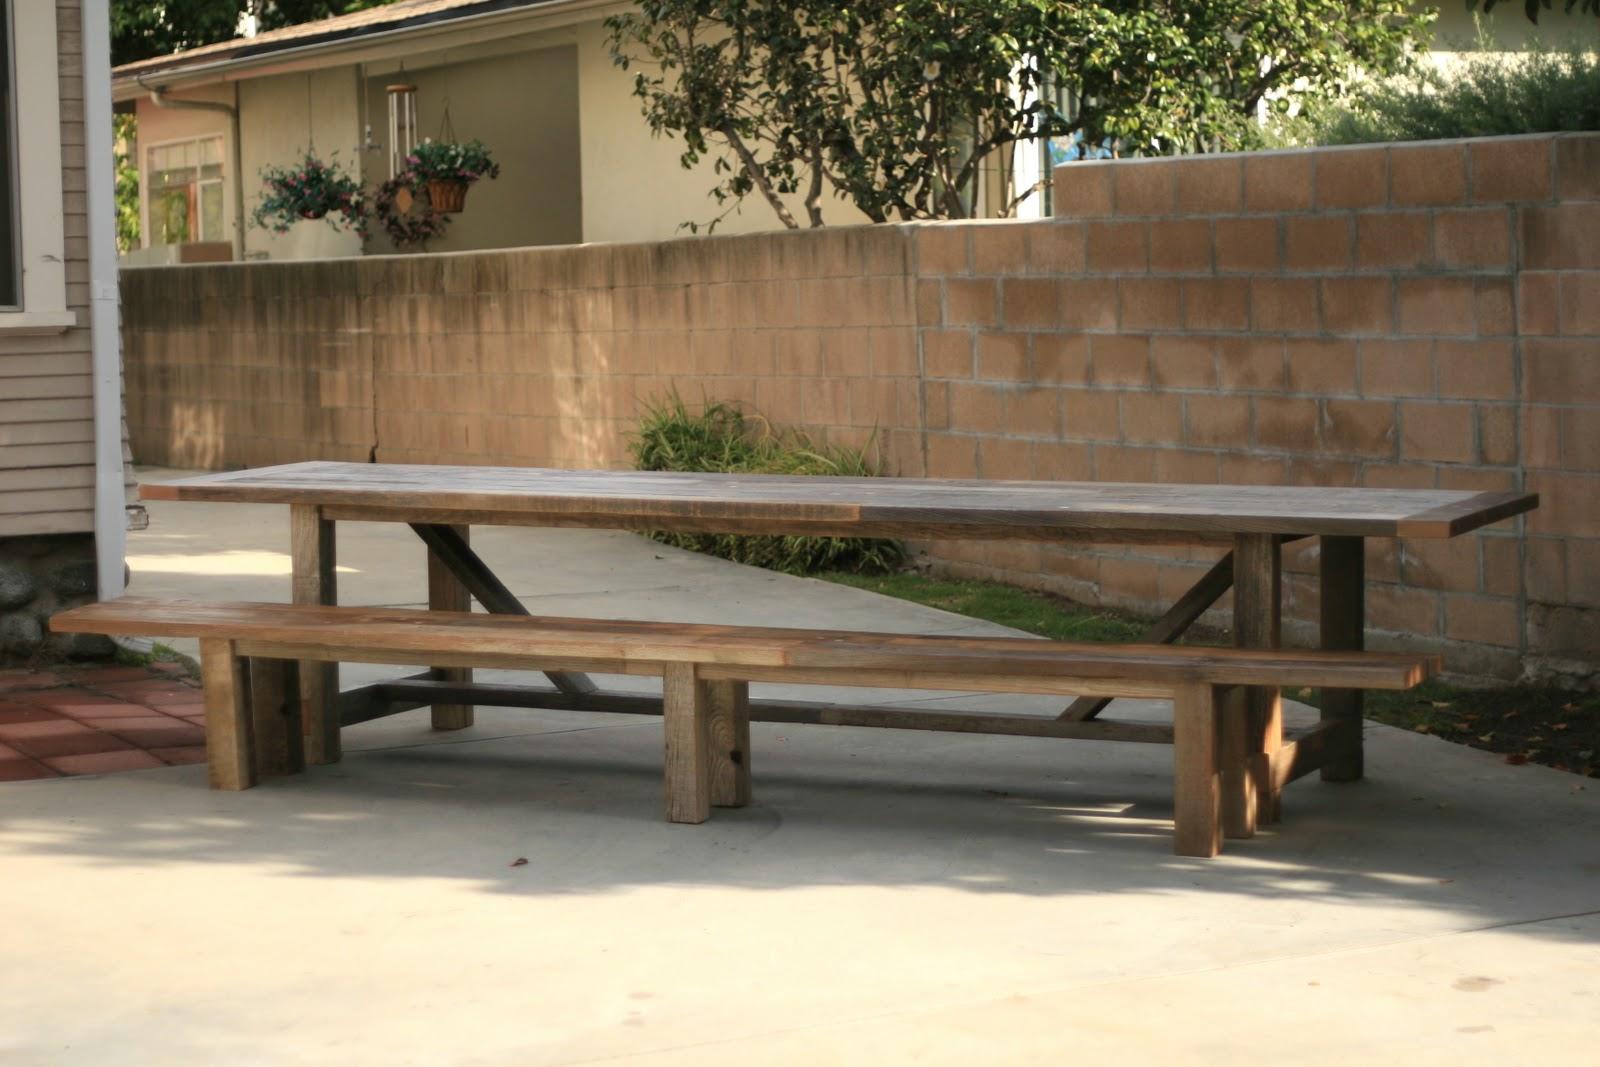 Arbor Exchange | Reclaimed Wood Furniture: 12 Foot Outdoor Trestle Table +  Bench